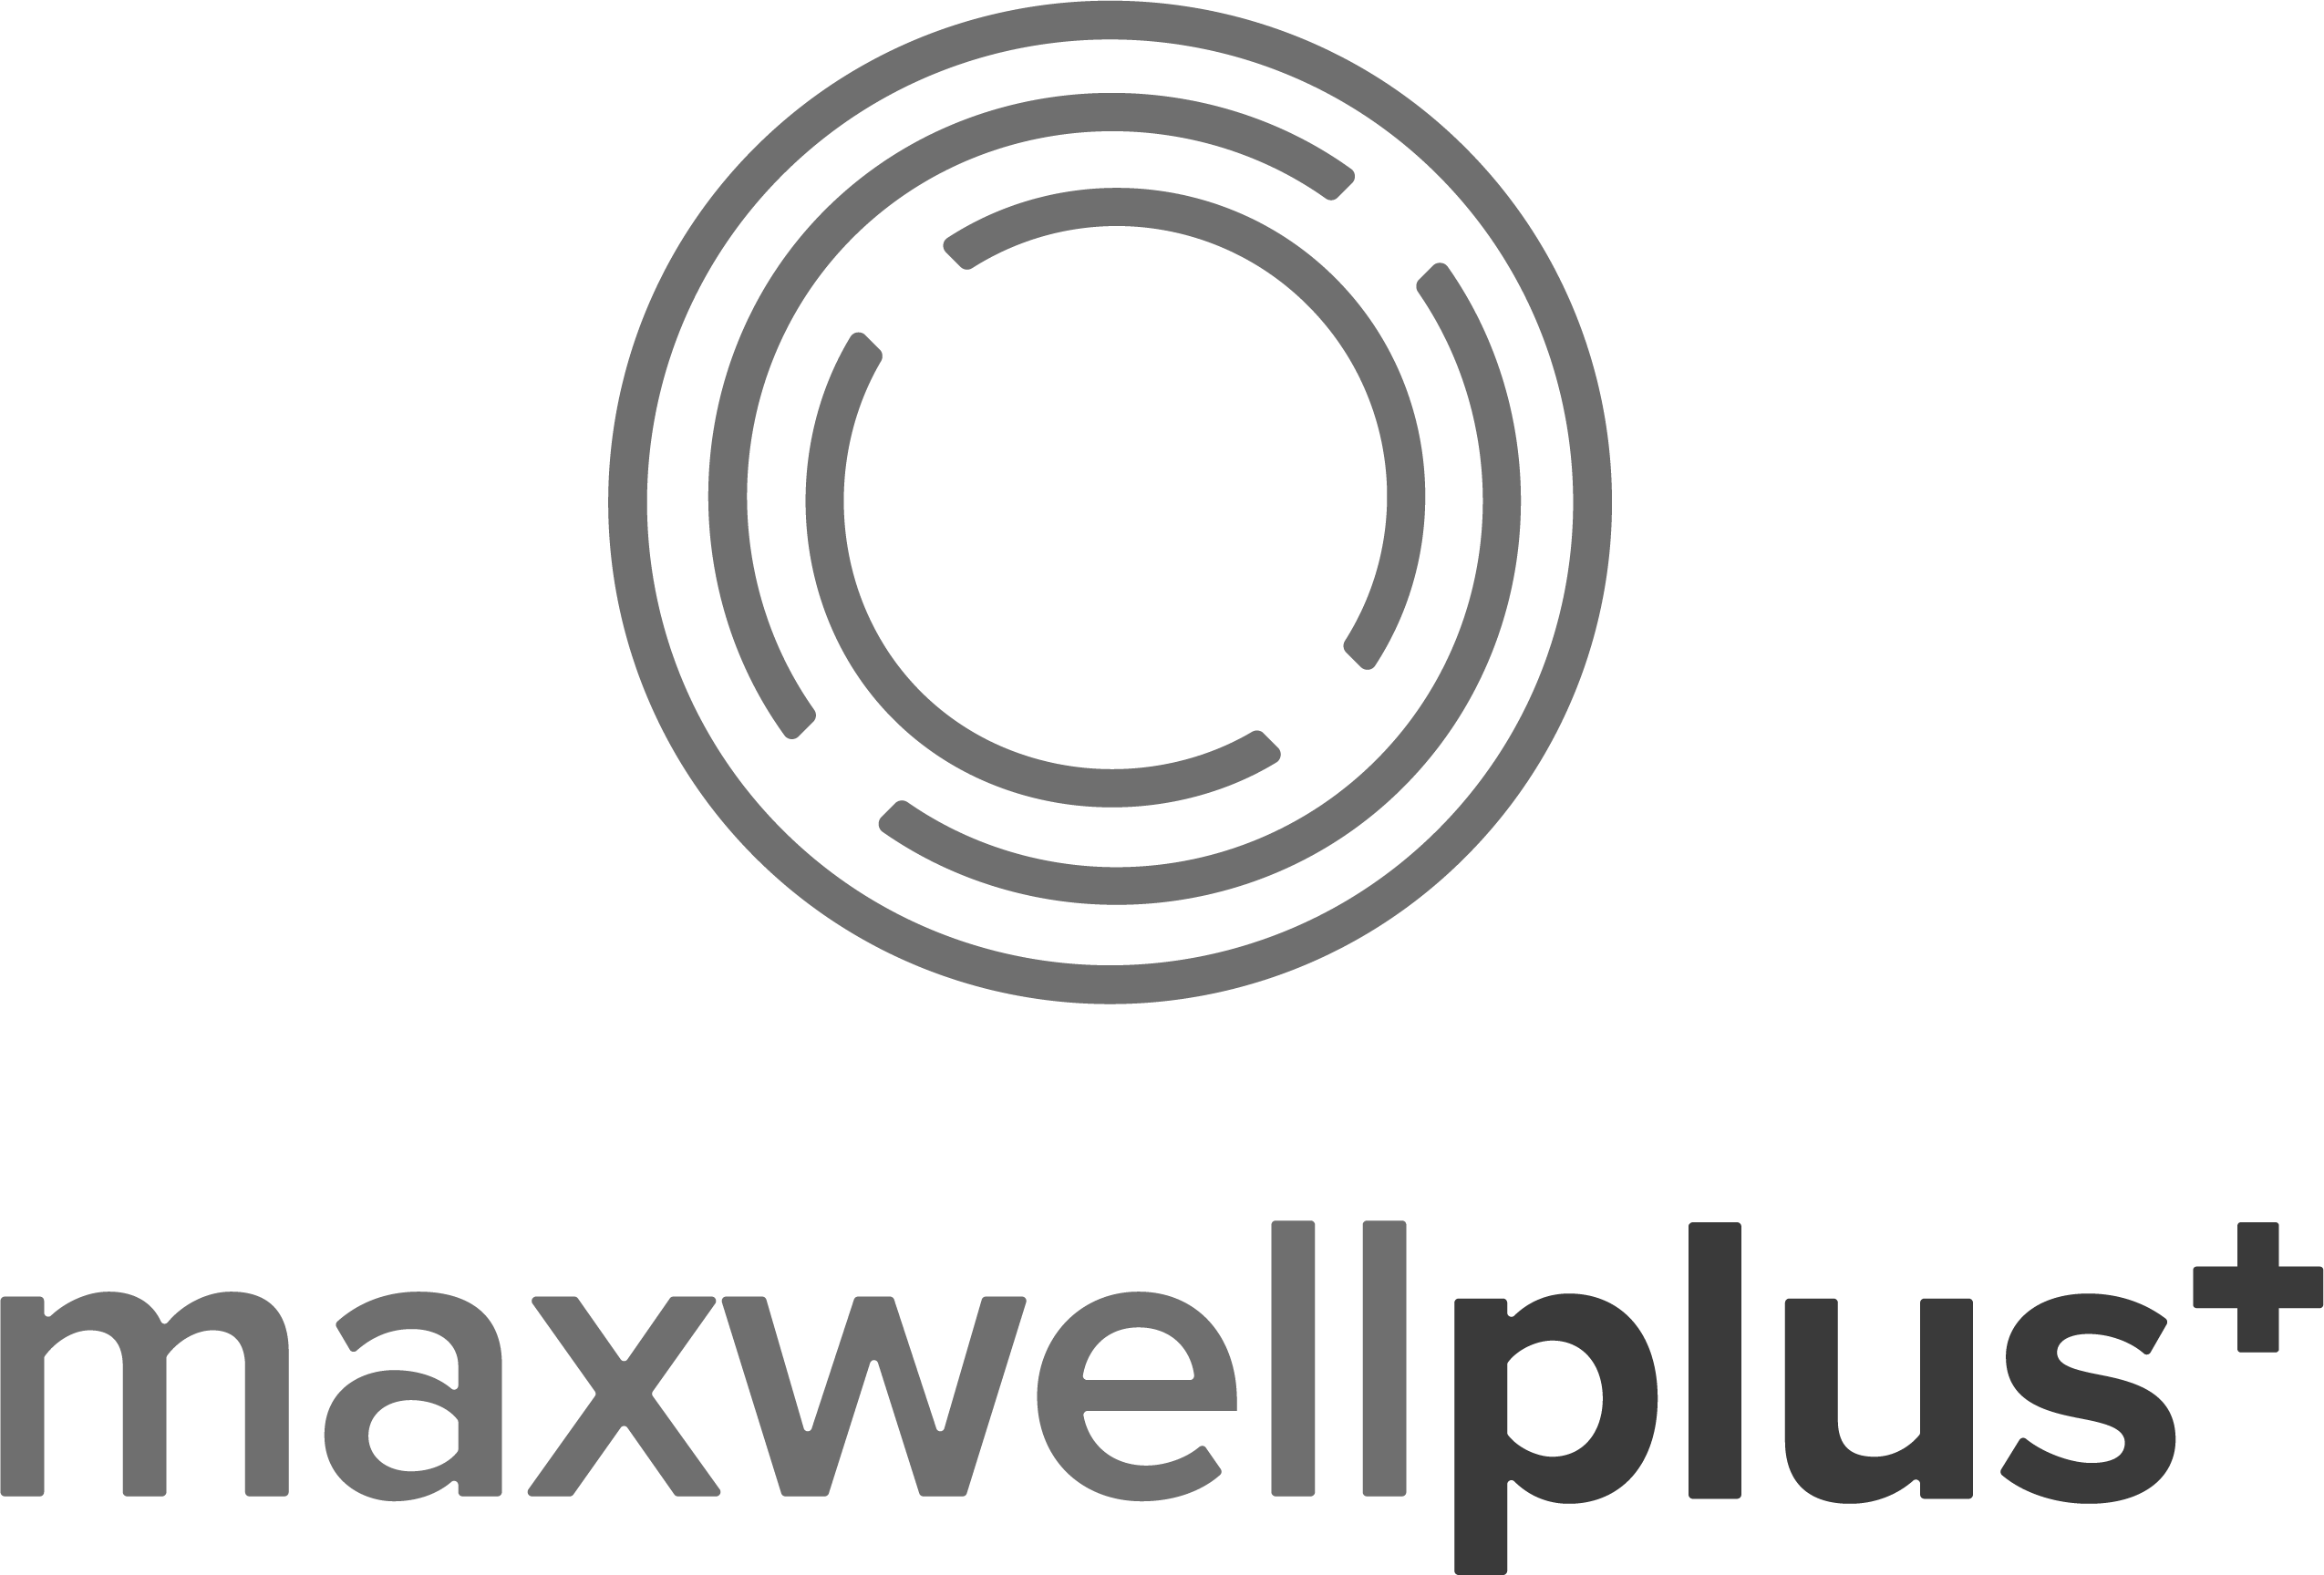 maxwell-plus-logo-iscreen